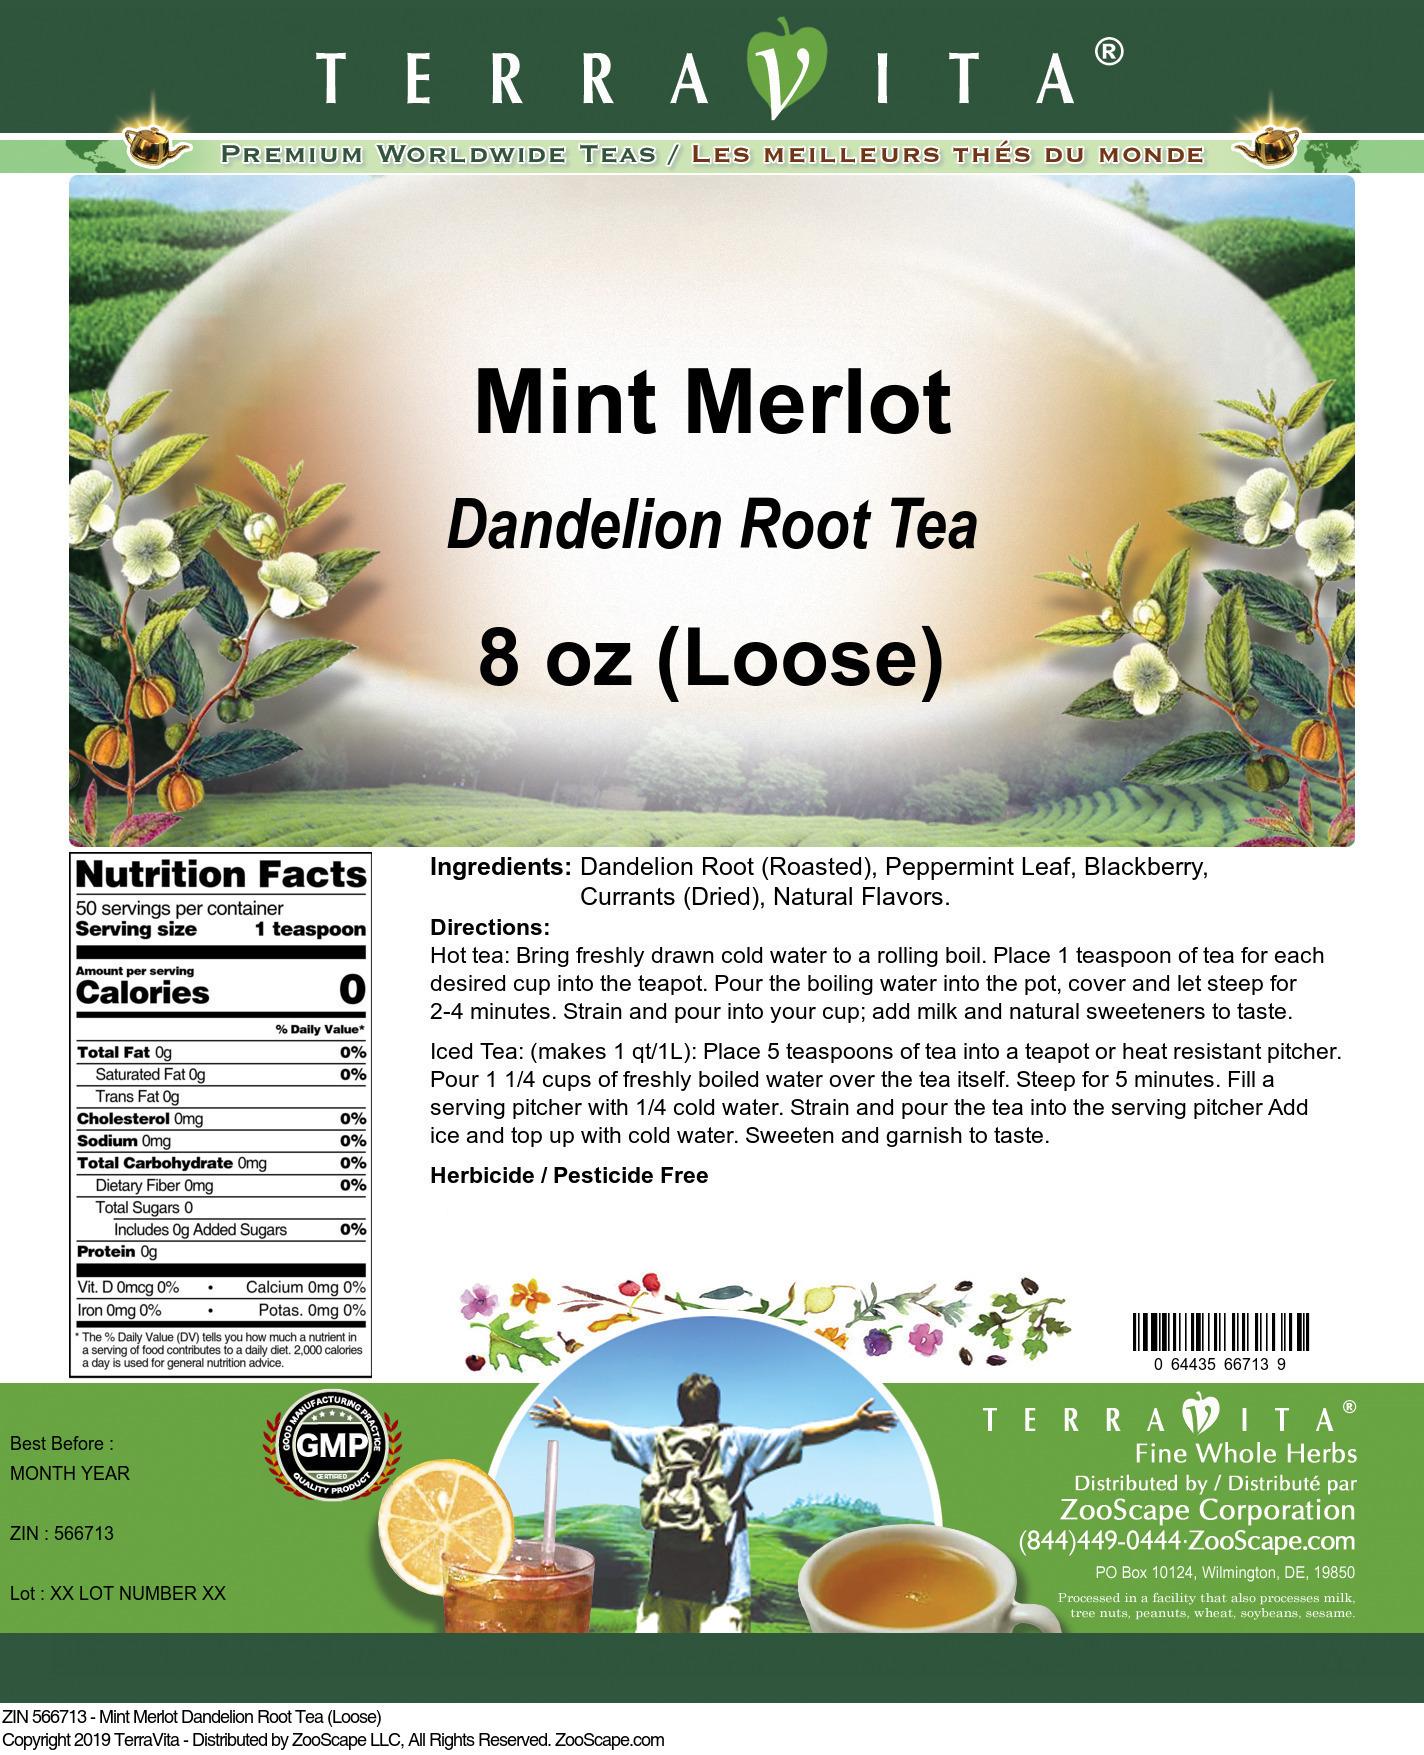 Mint Merlot Dandelion Root Tea (Loose)